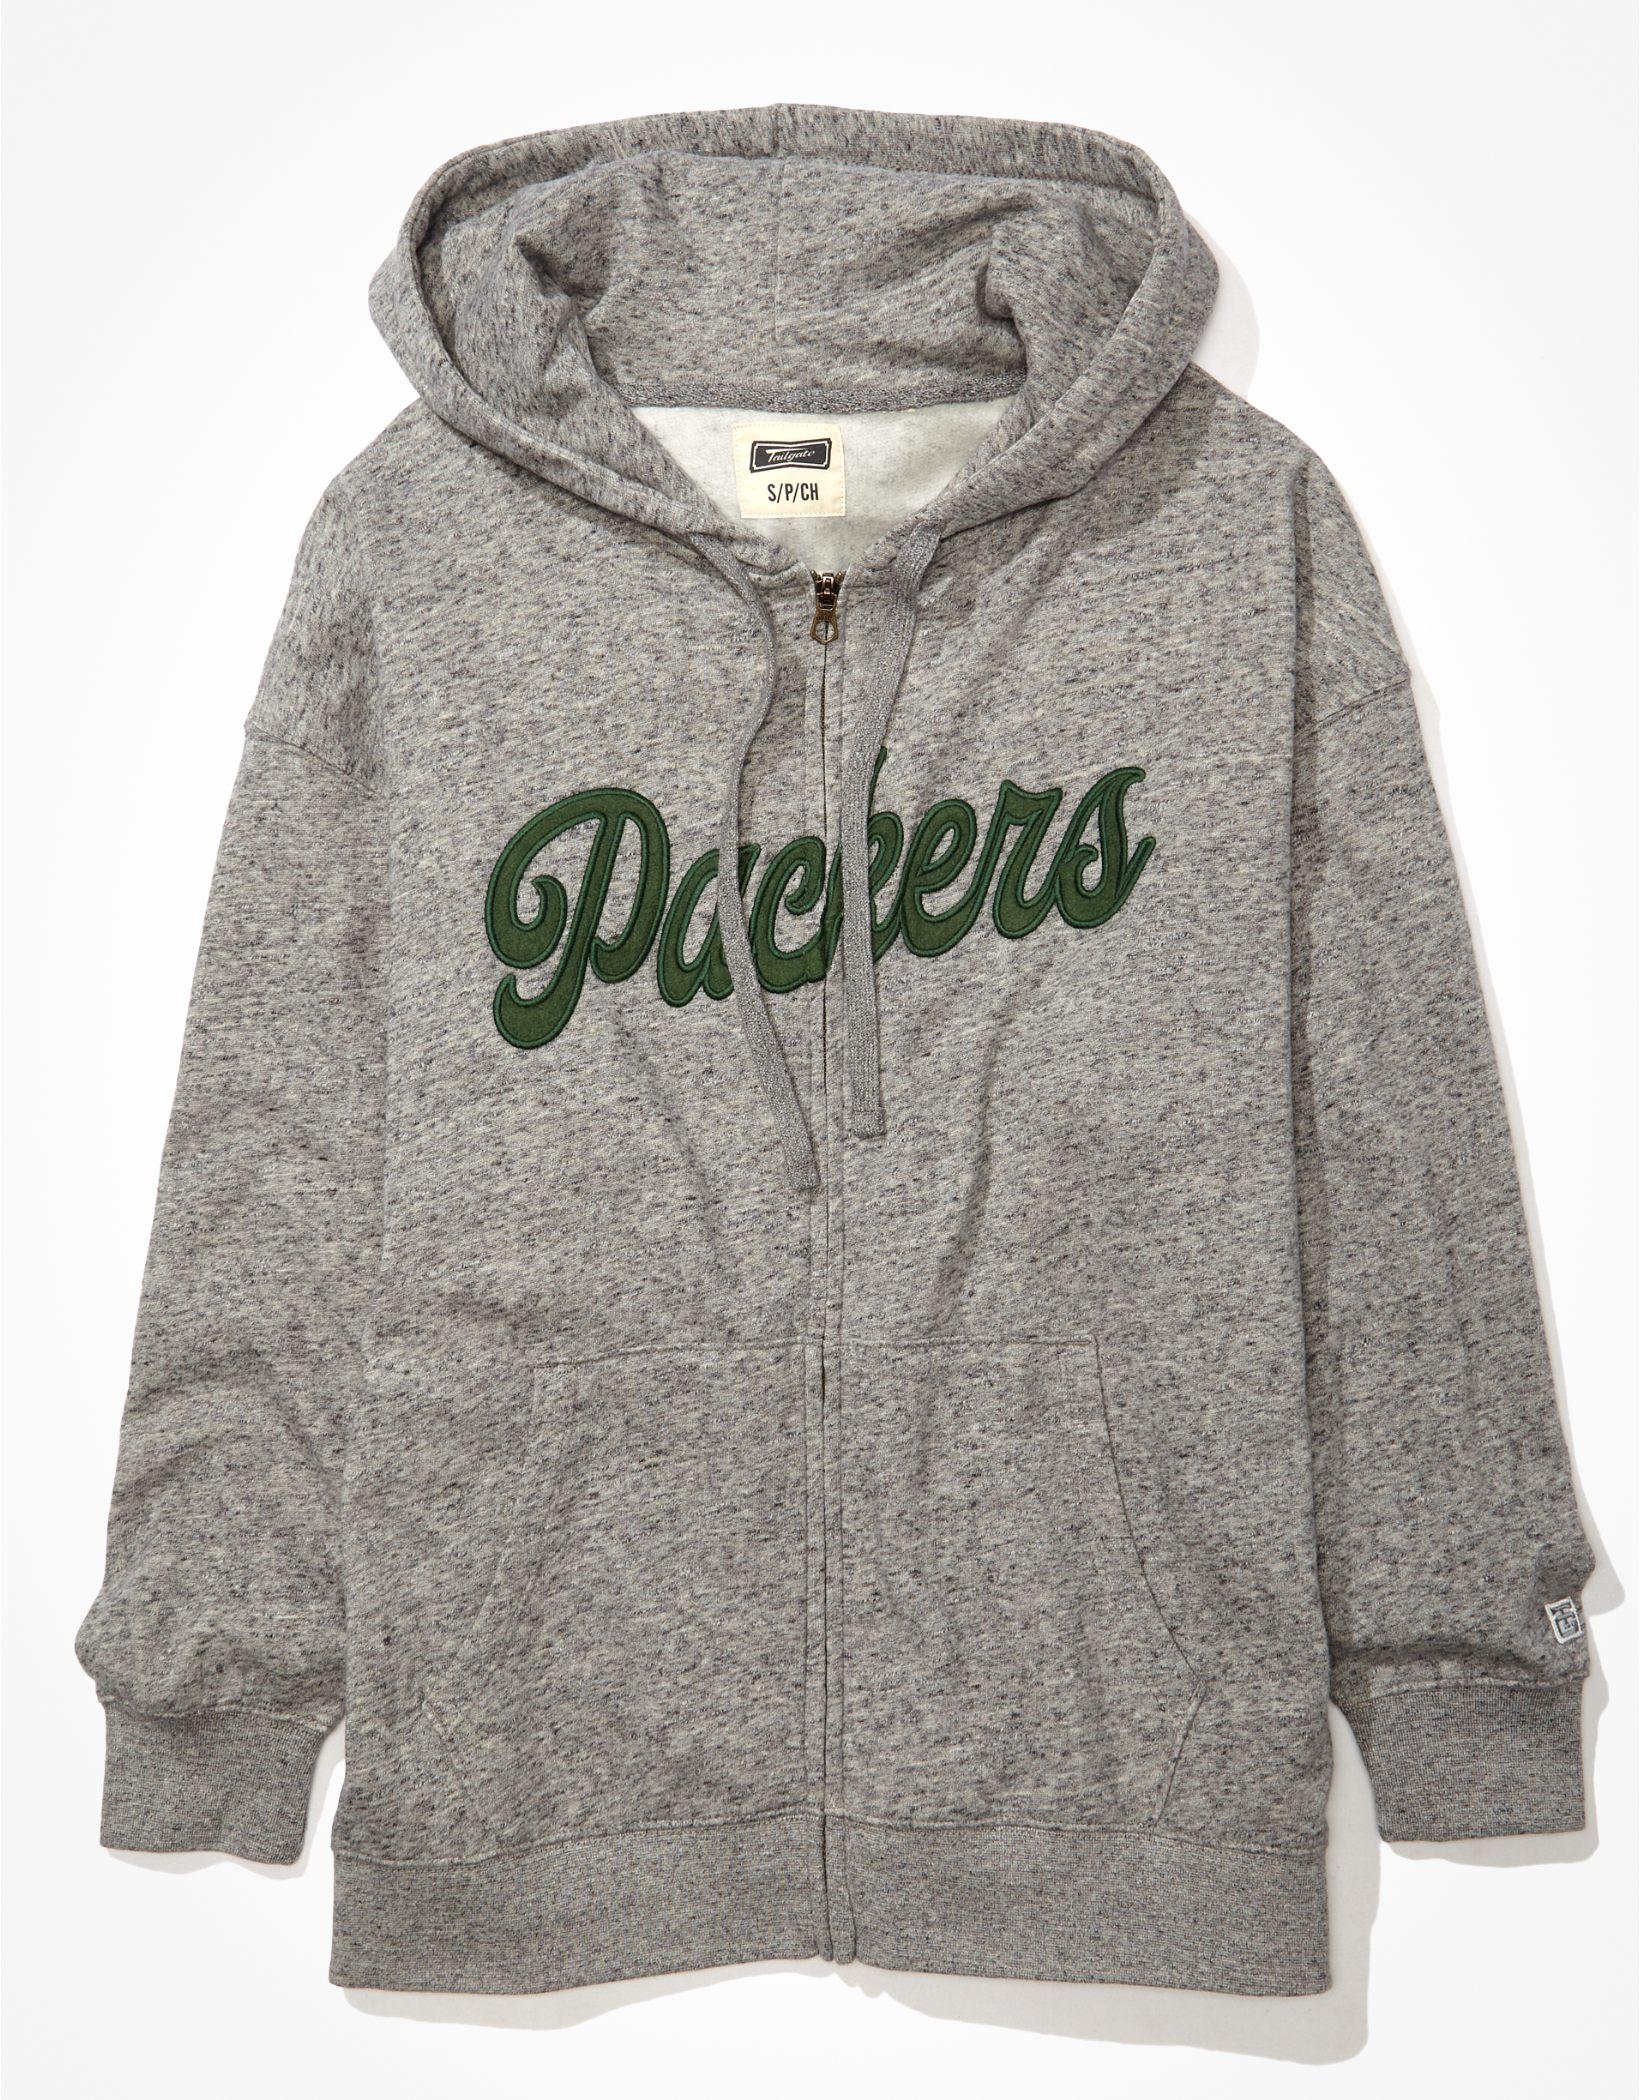 Tailgate Women's Green Bay Packers Oversized Zip-Up Hoodie